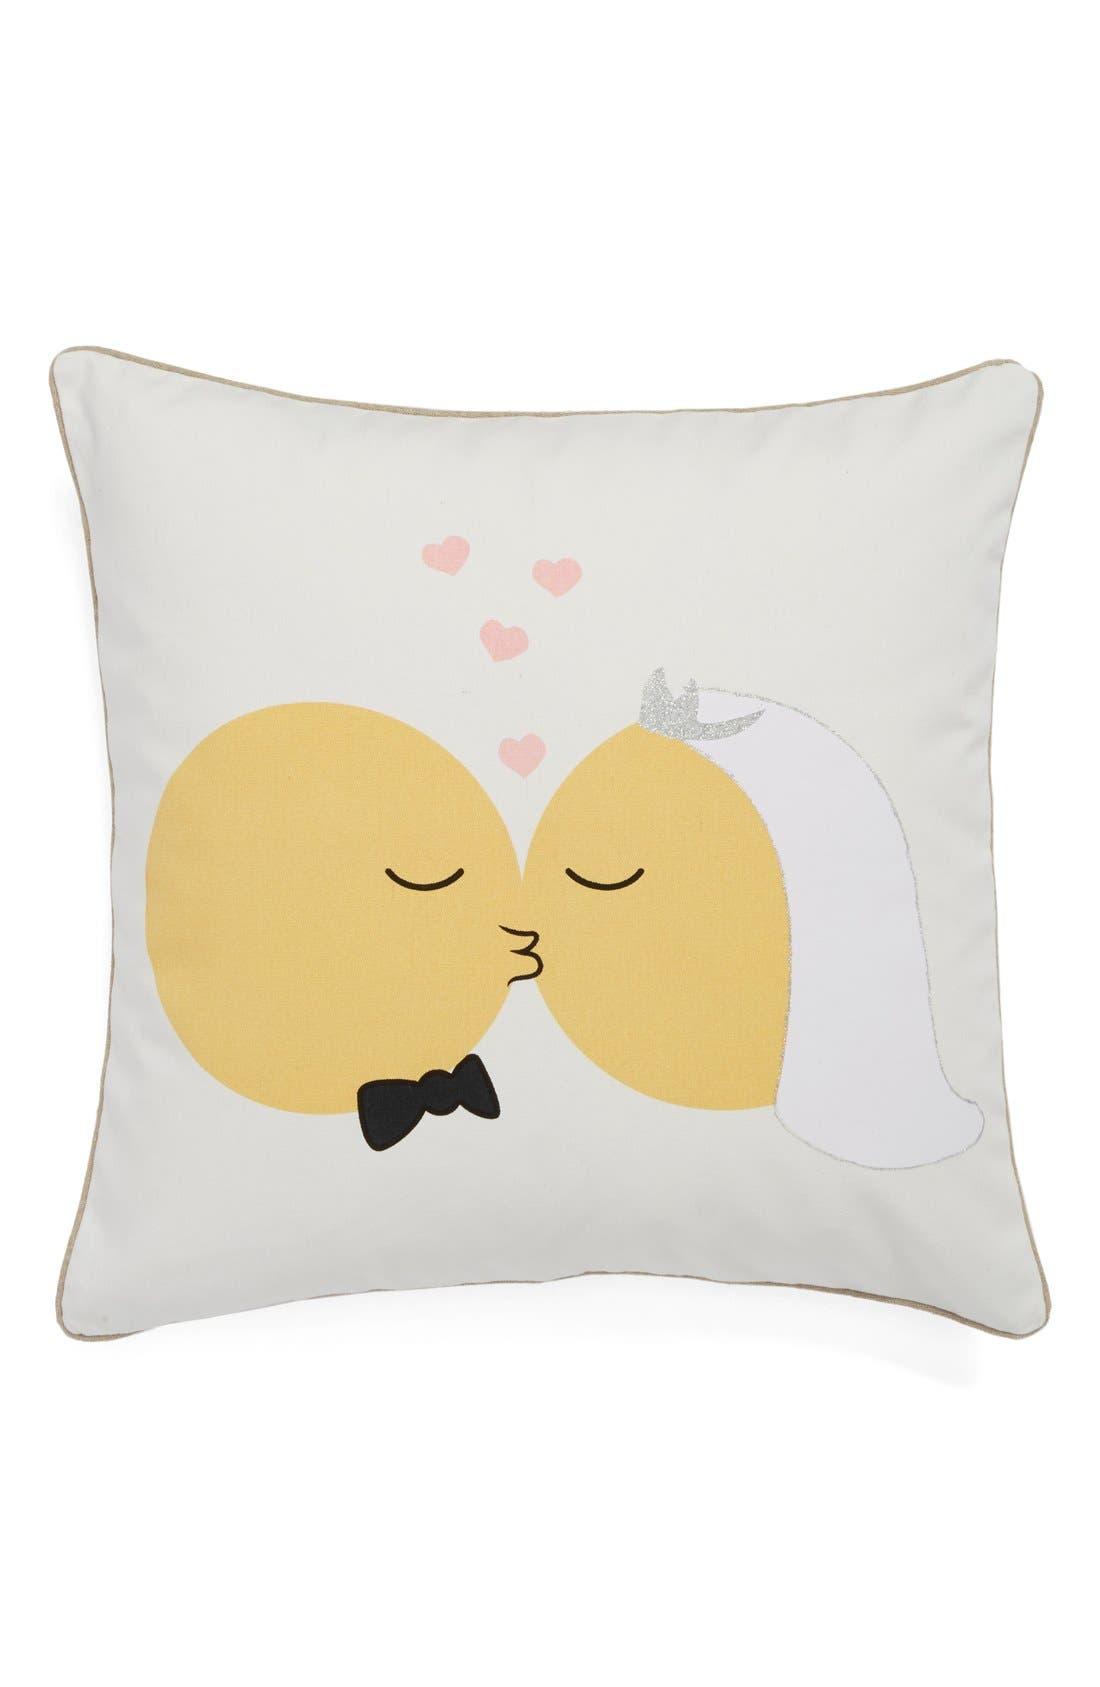 Main Image - Levtex 'Married Emoji' Pillow